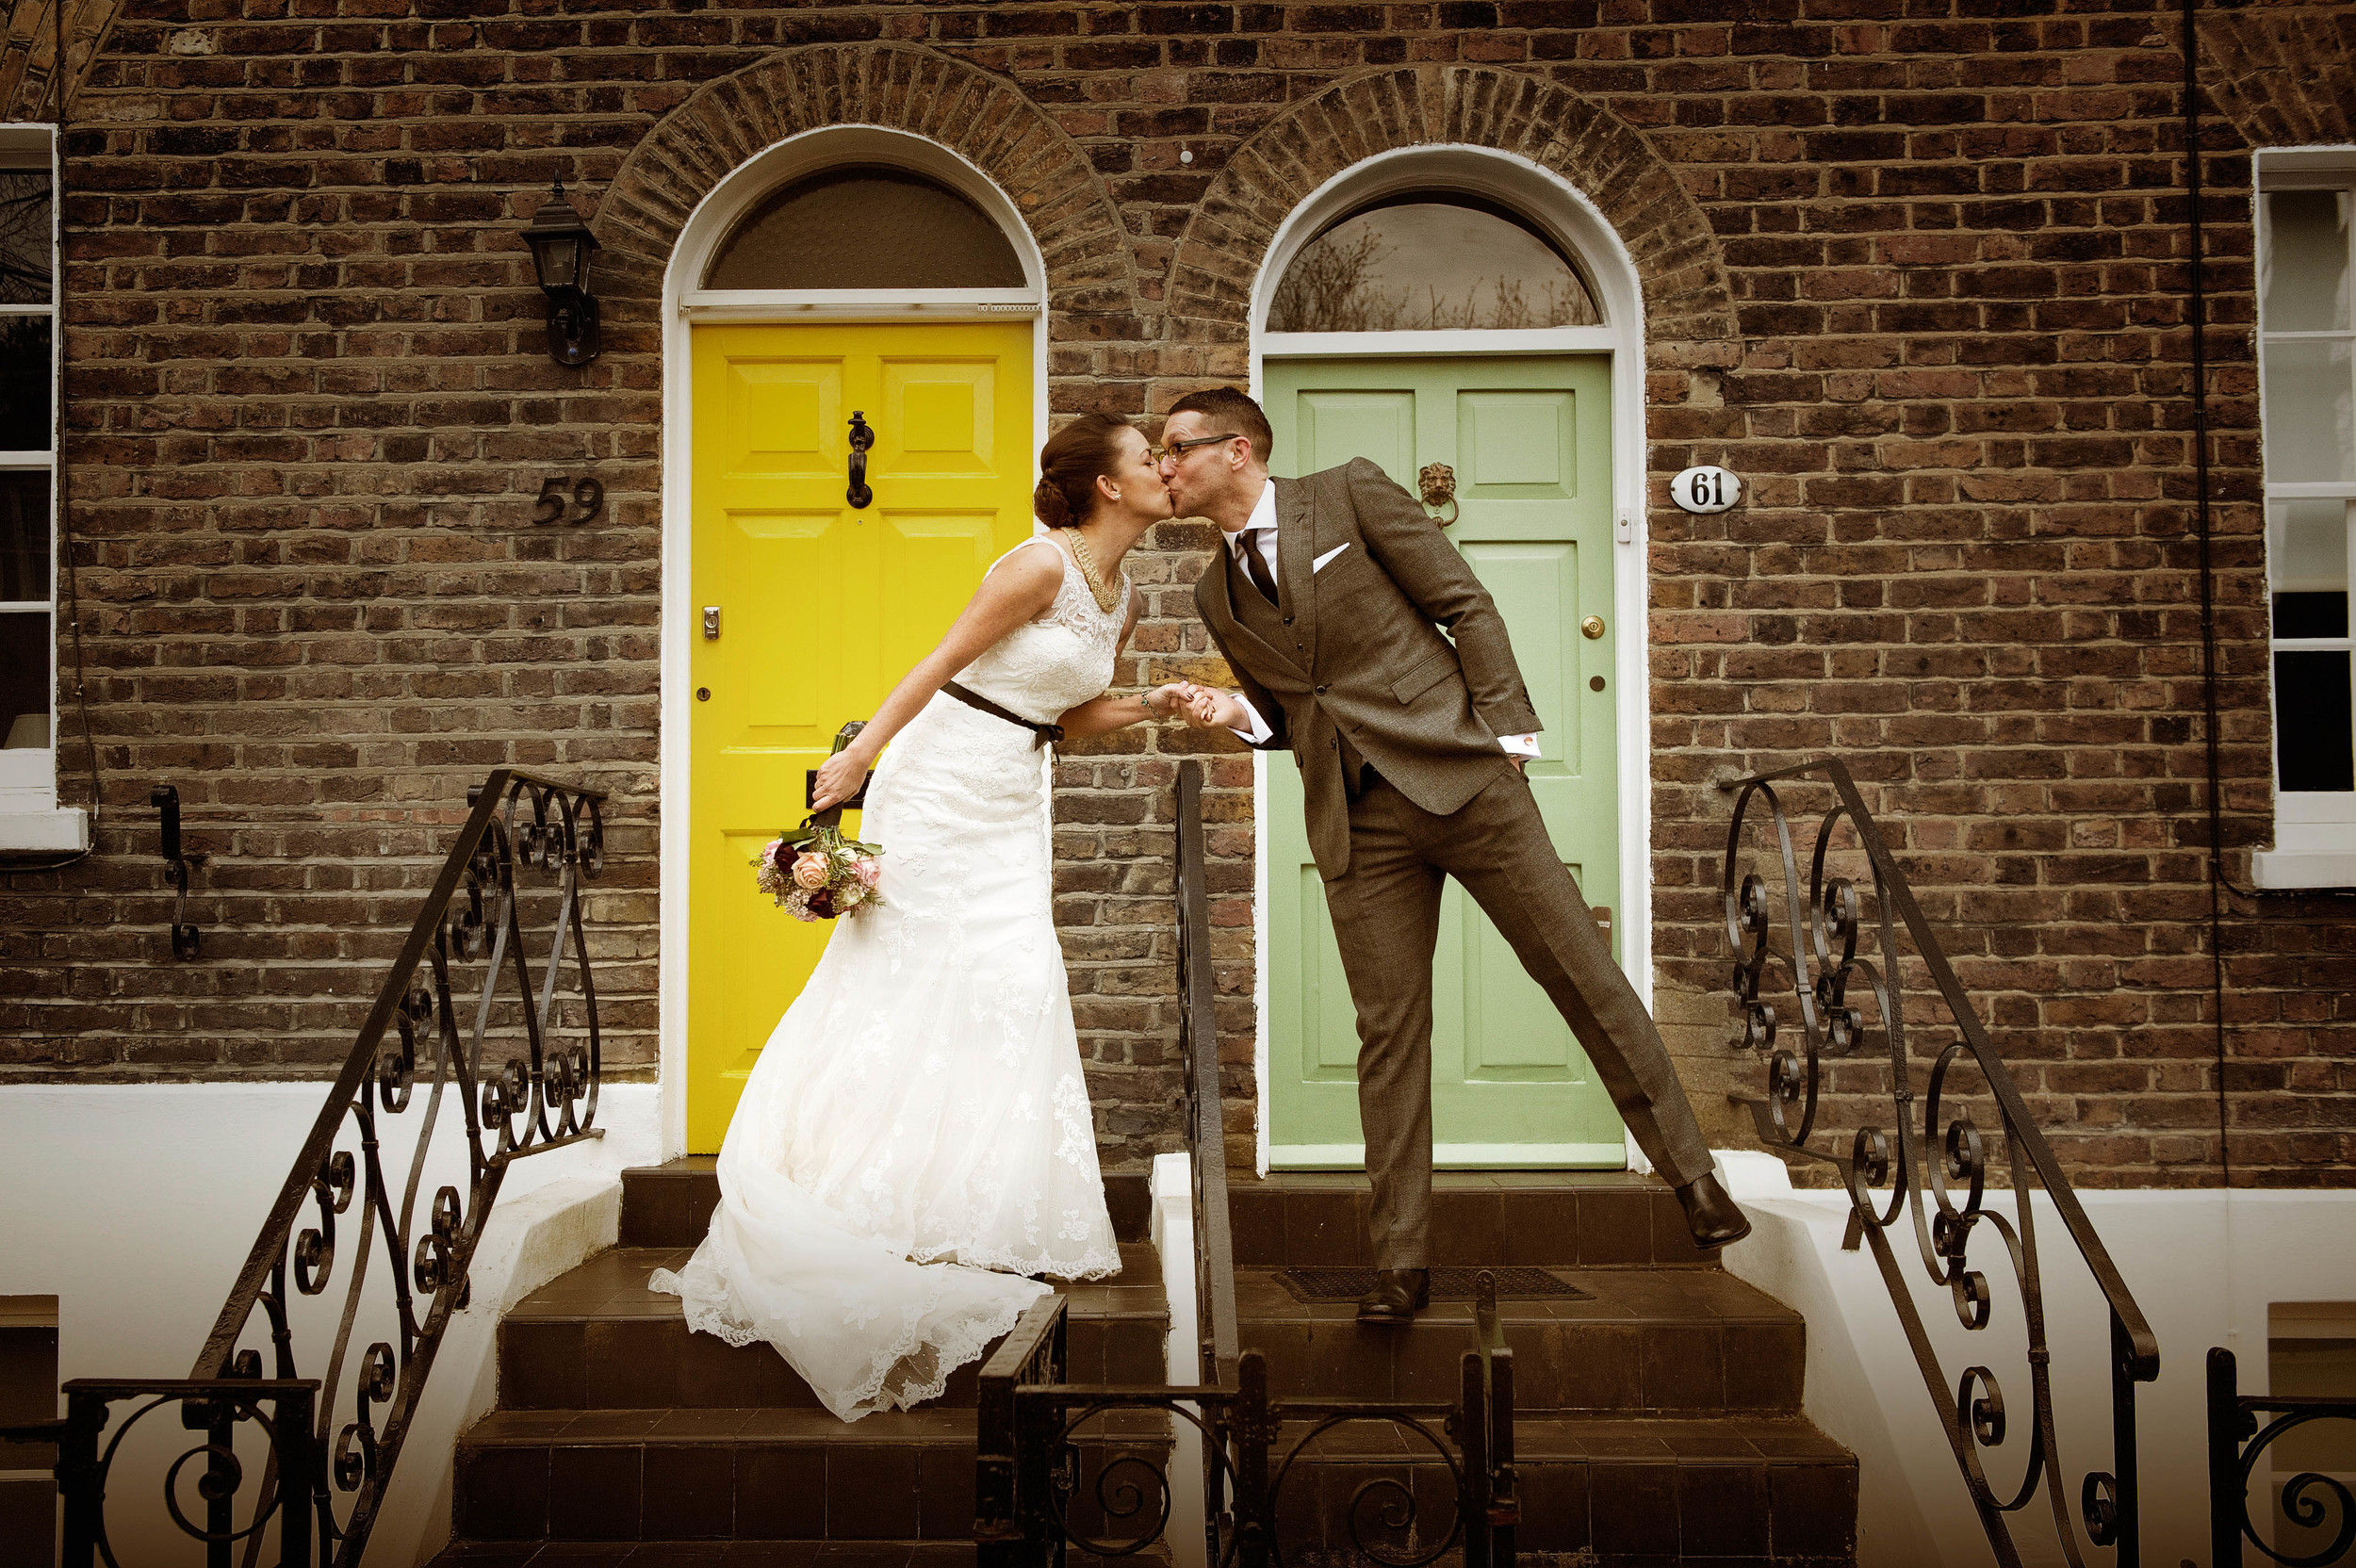 tips-for-wedding-photography-photo-retouching-sample